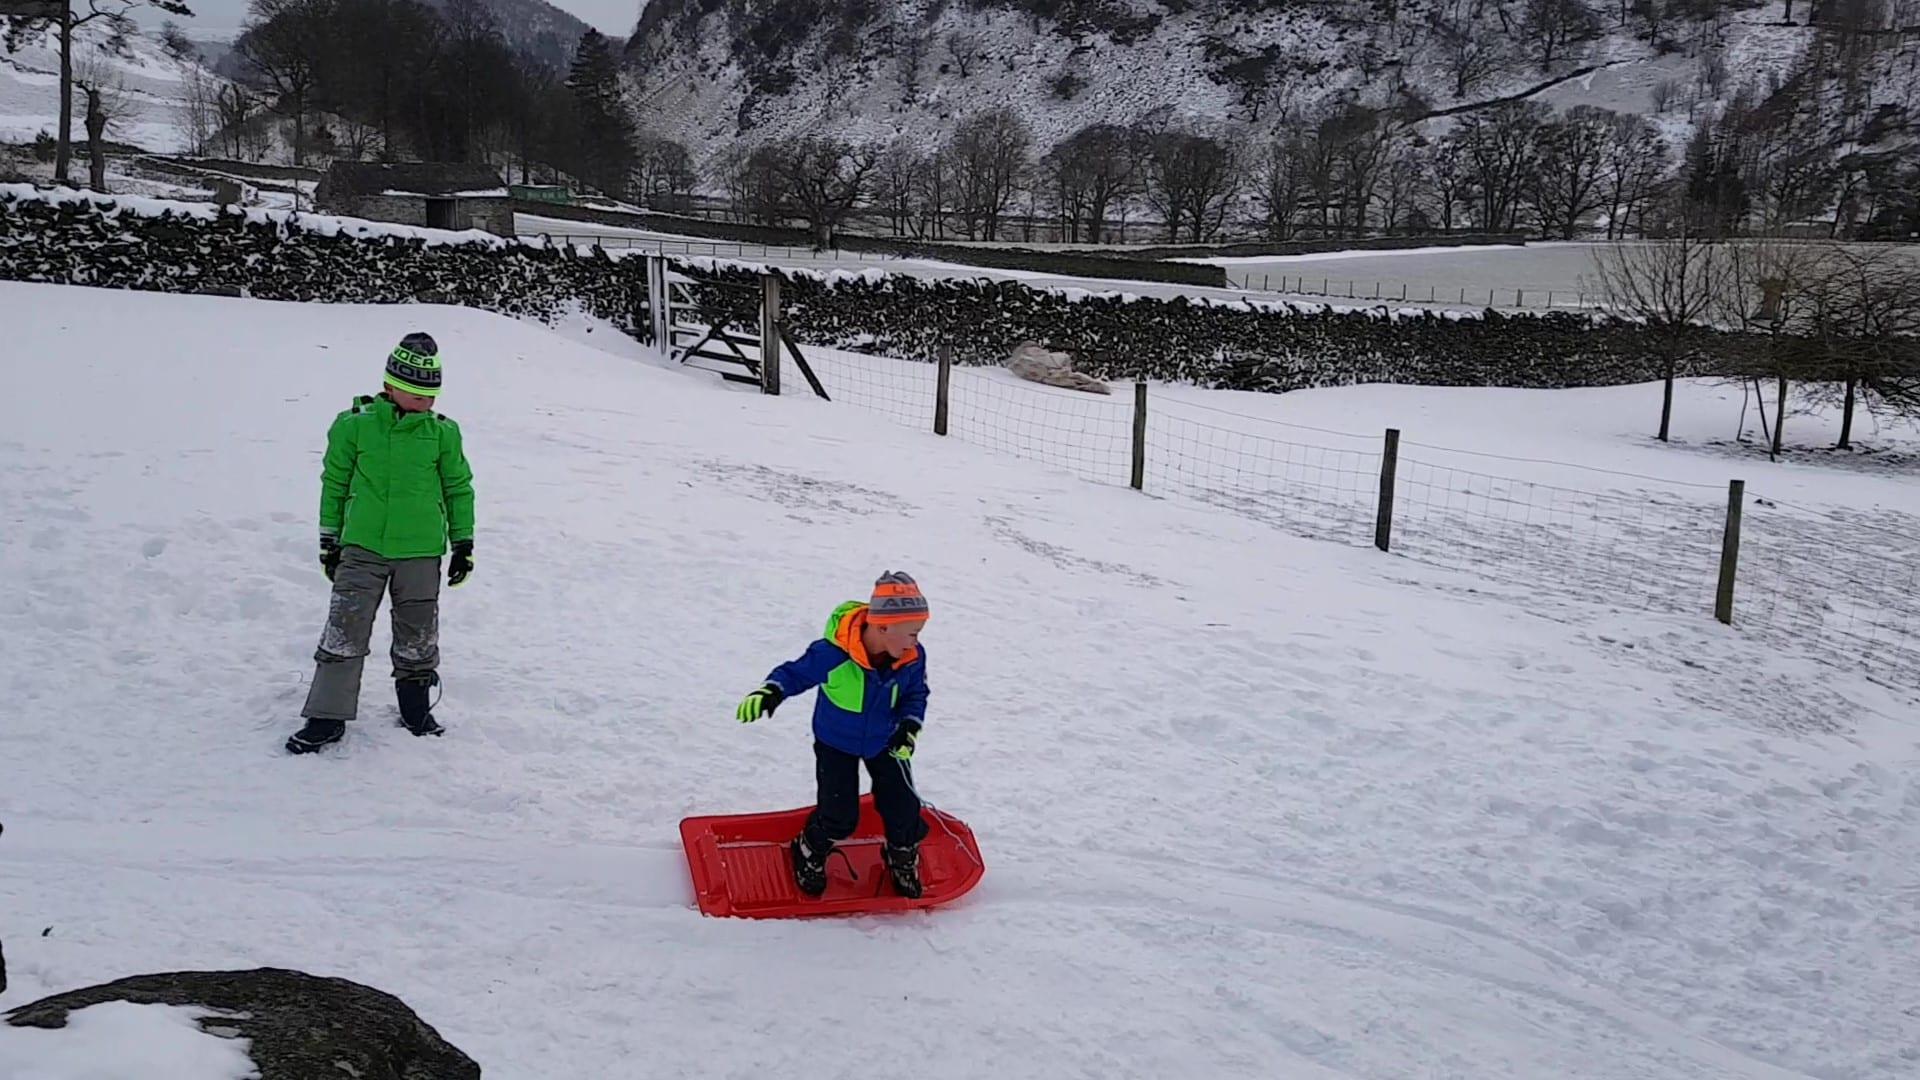 Boys sledging